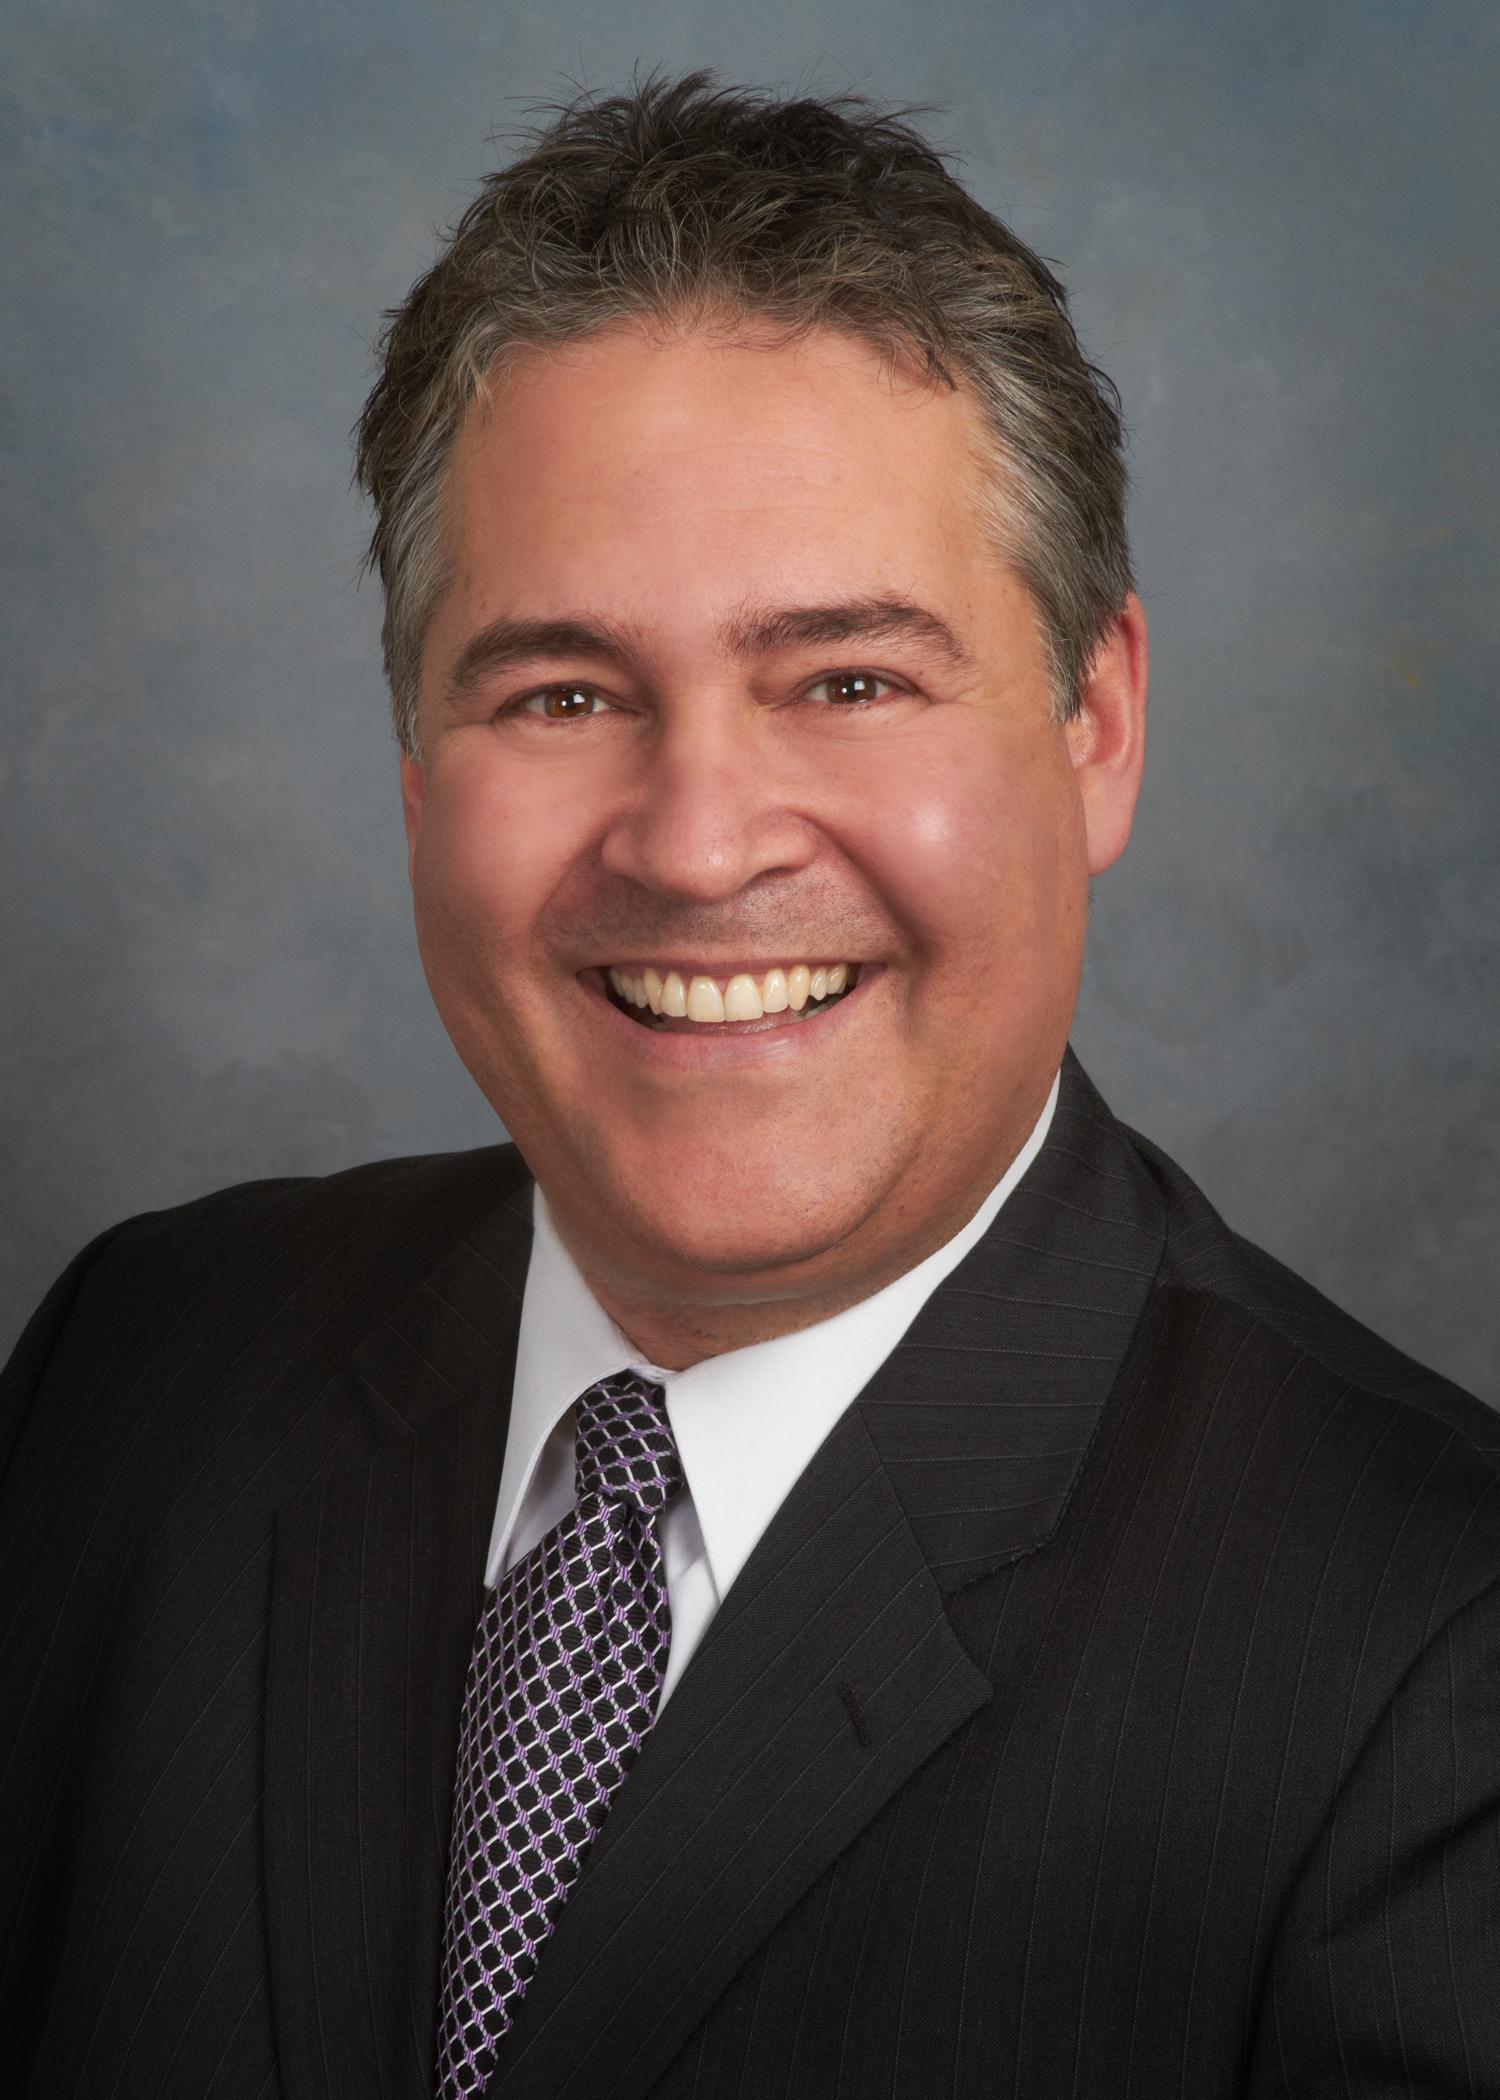 Paul Spigner